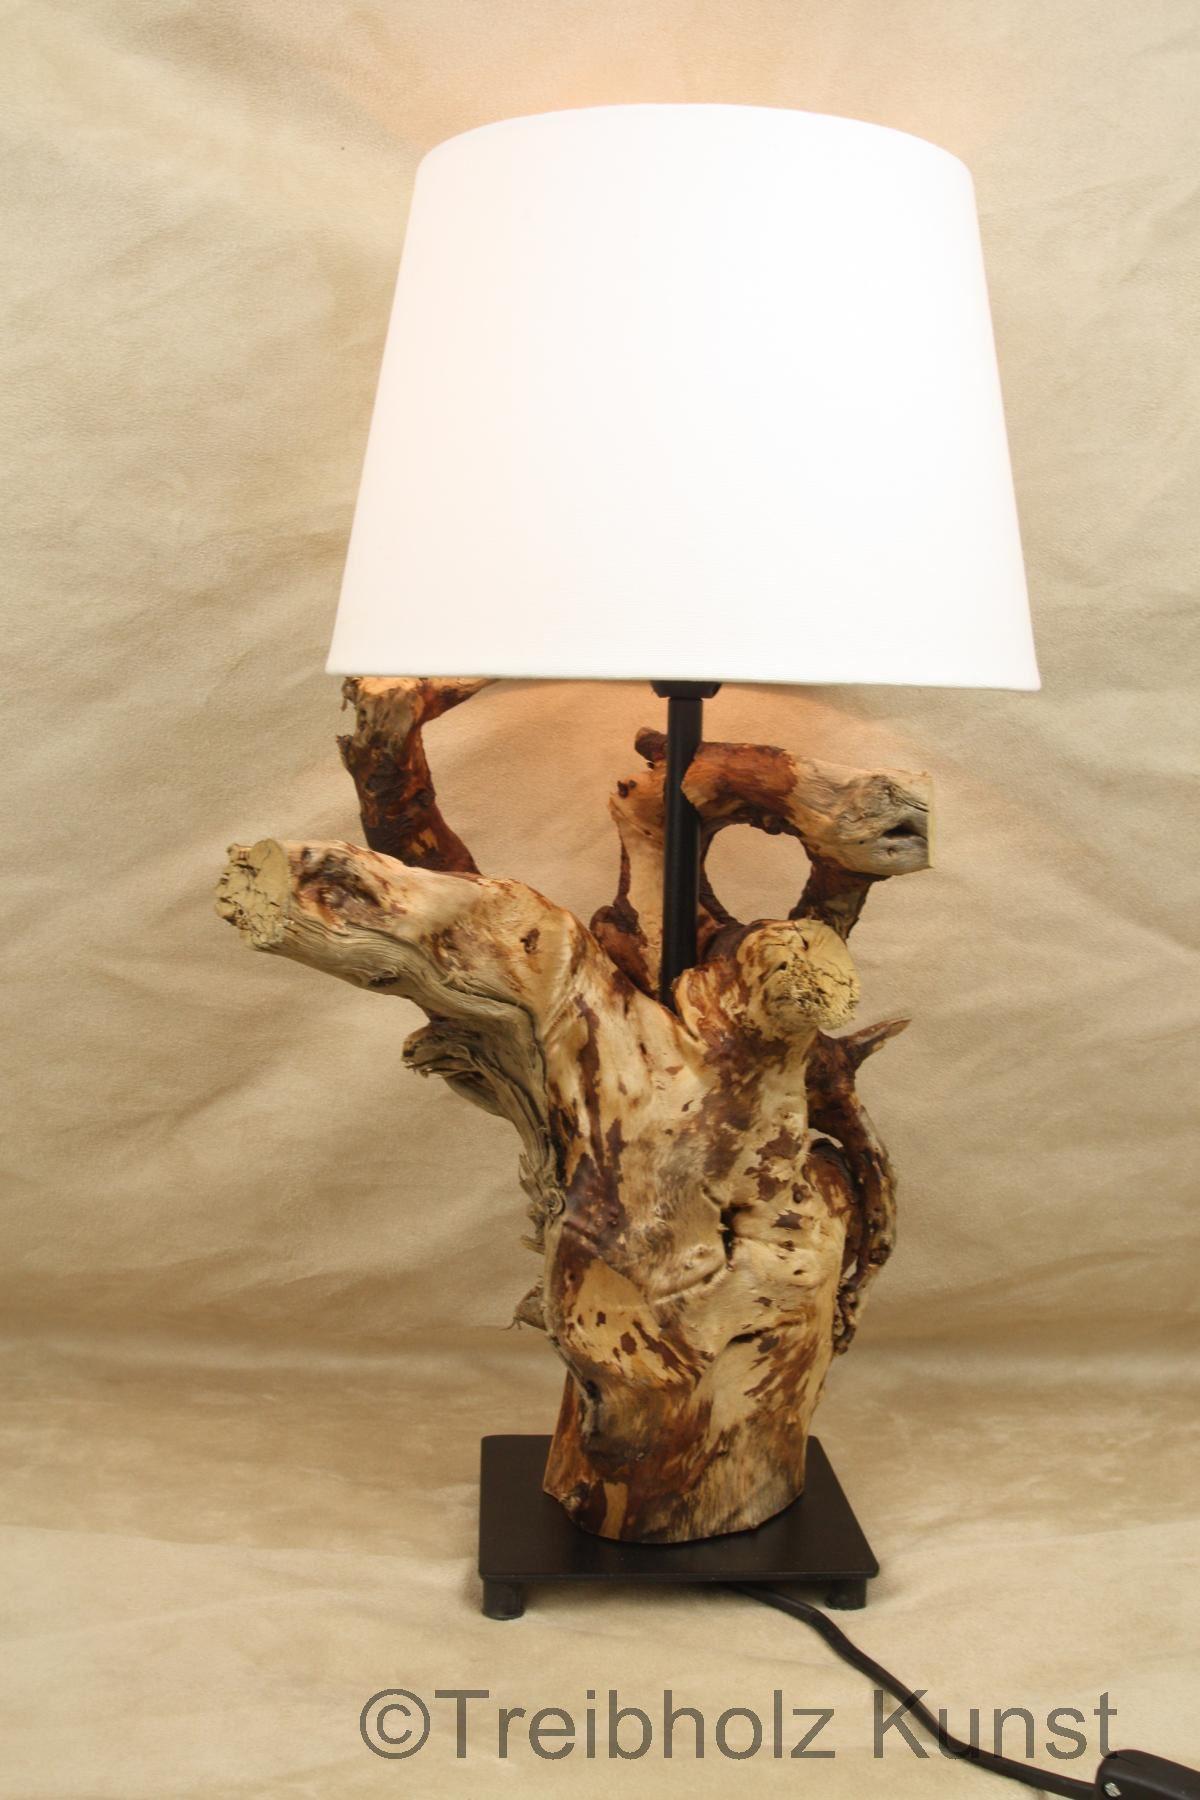 treibholz nachttischlampe tischlampe unikat. Black Bedroom Furniture Sets. Home Design Ideas